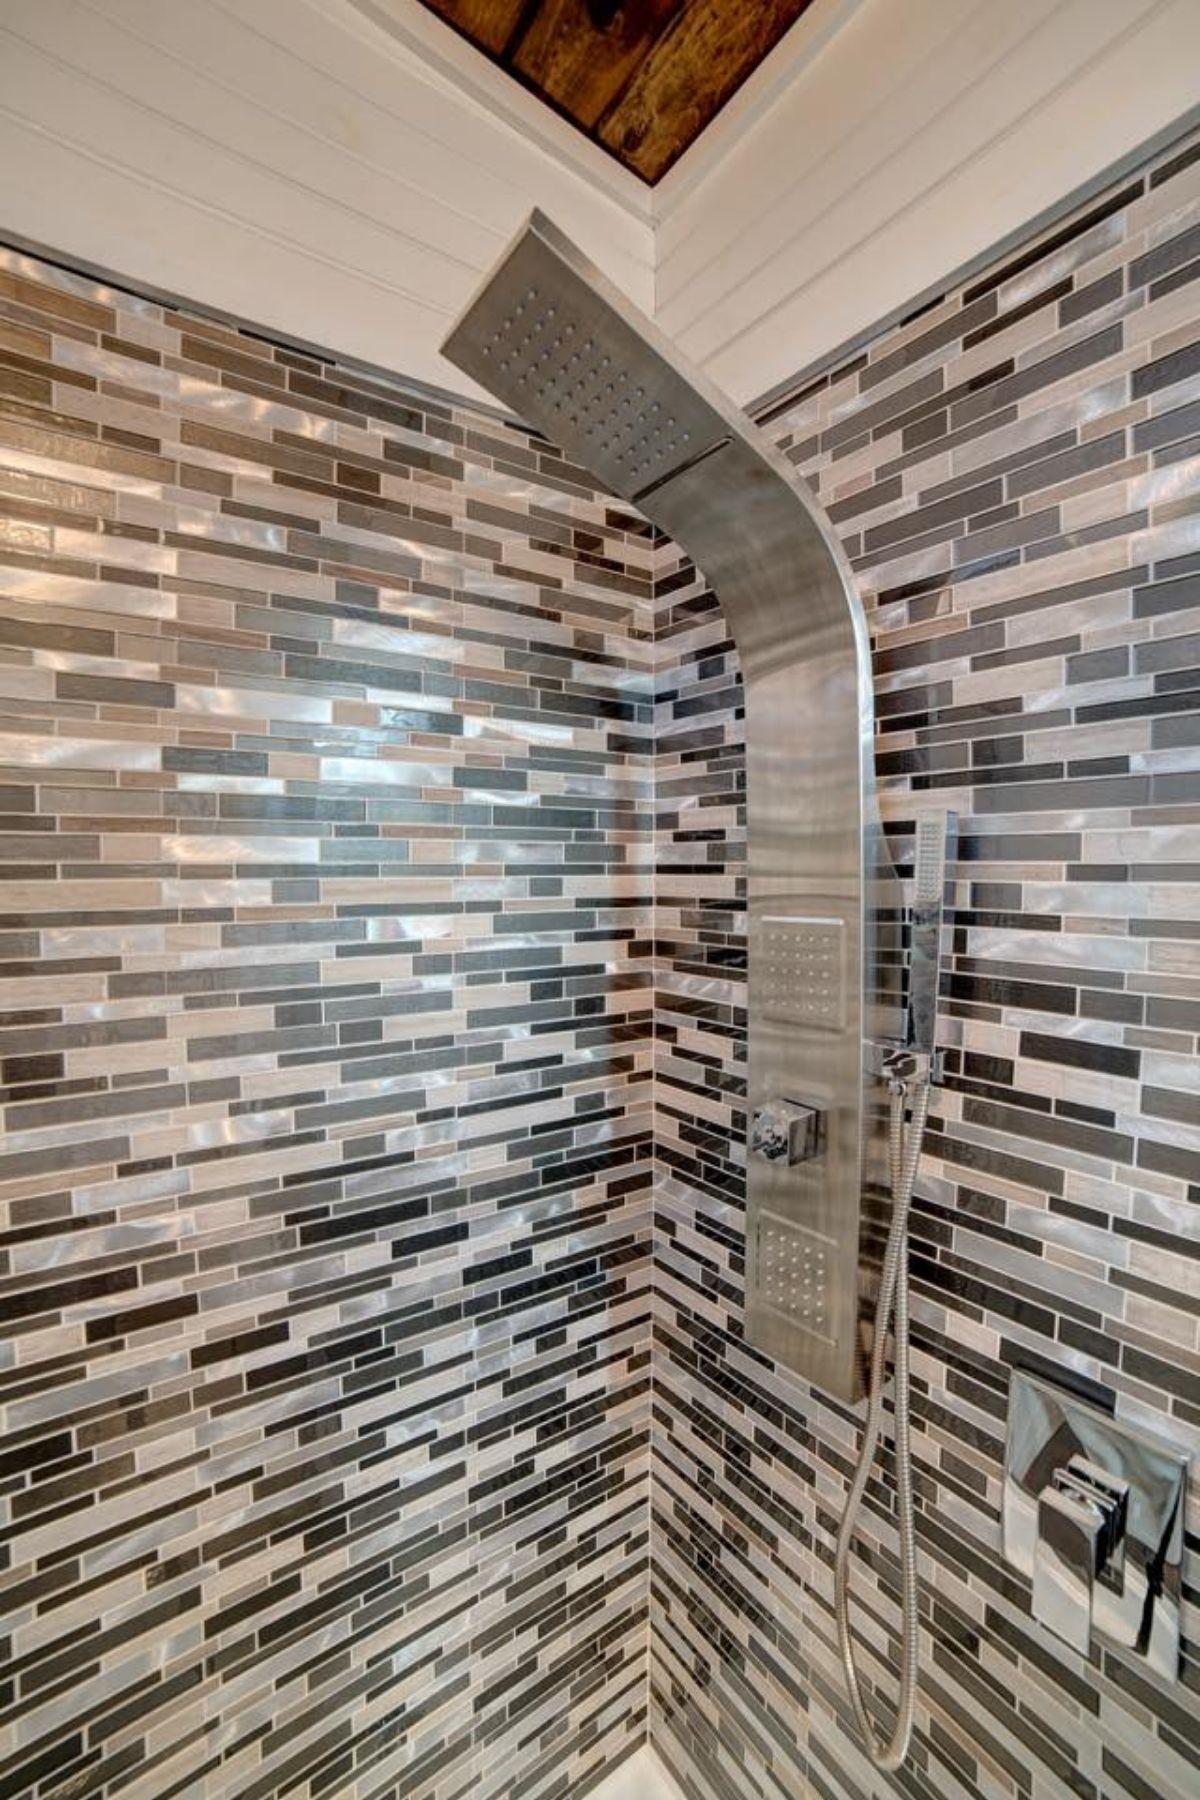 Spa shower head in tiled shower stall